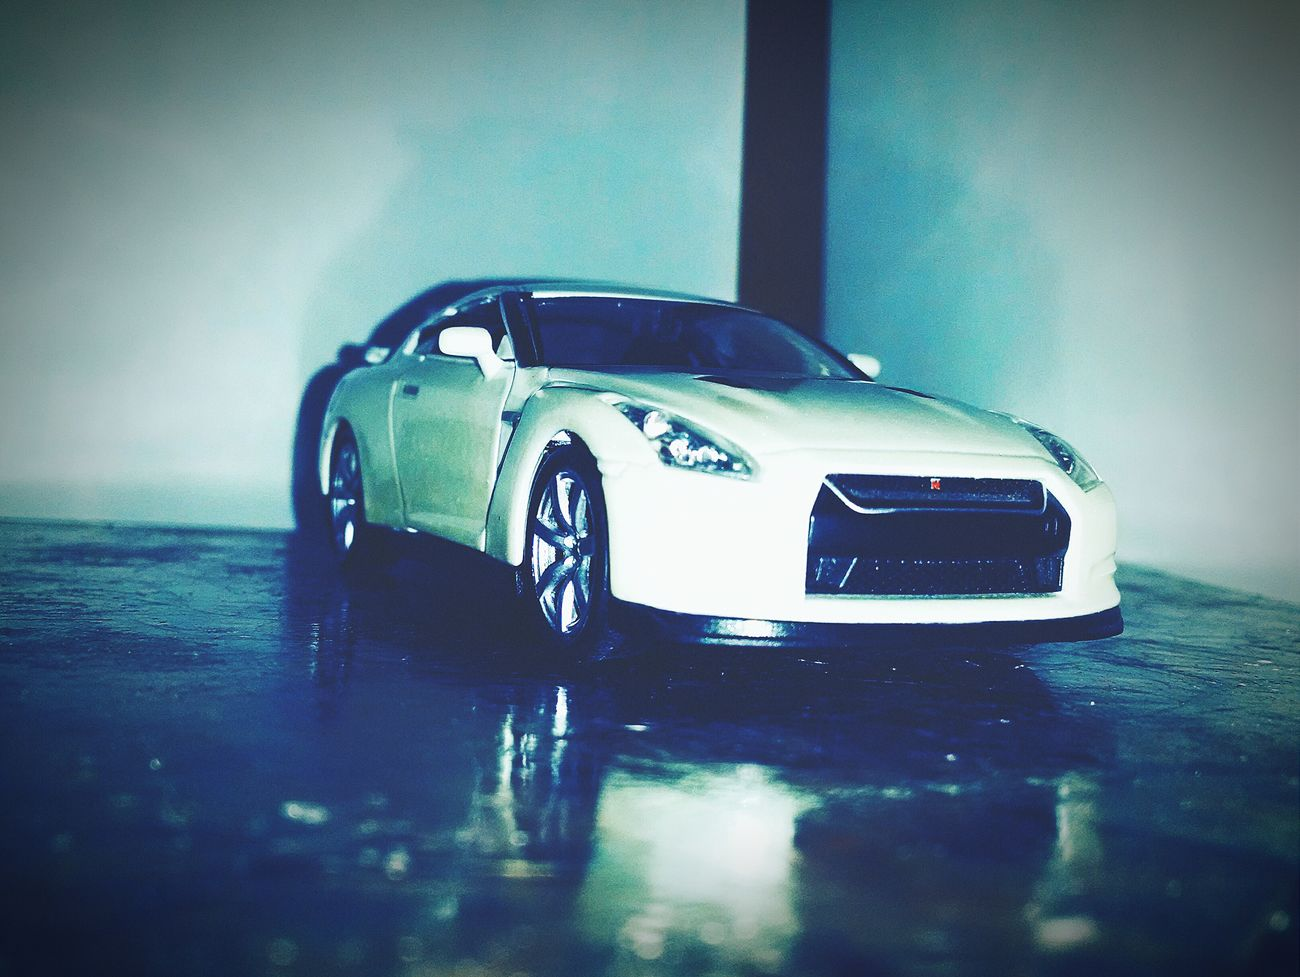 My Best Photo 2014 Nissan GTR Cars Coleccion